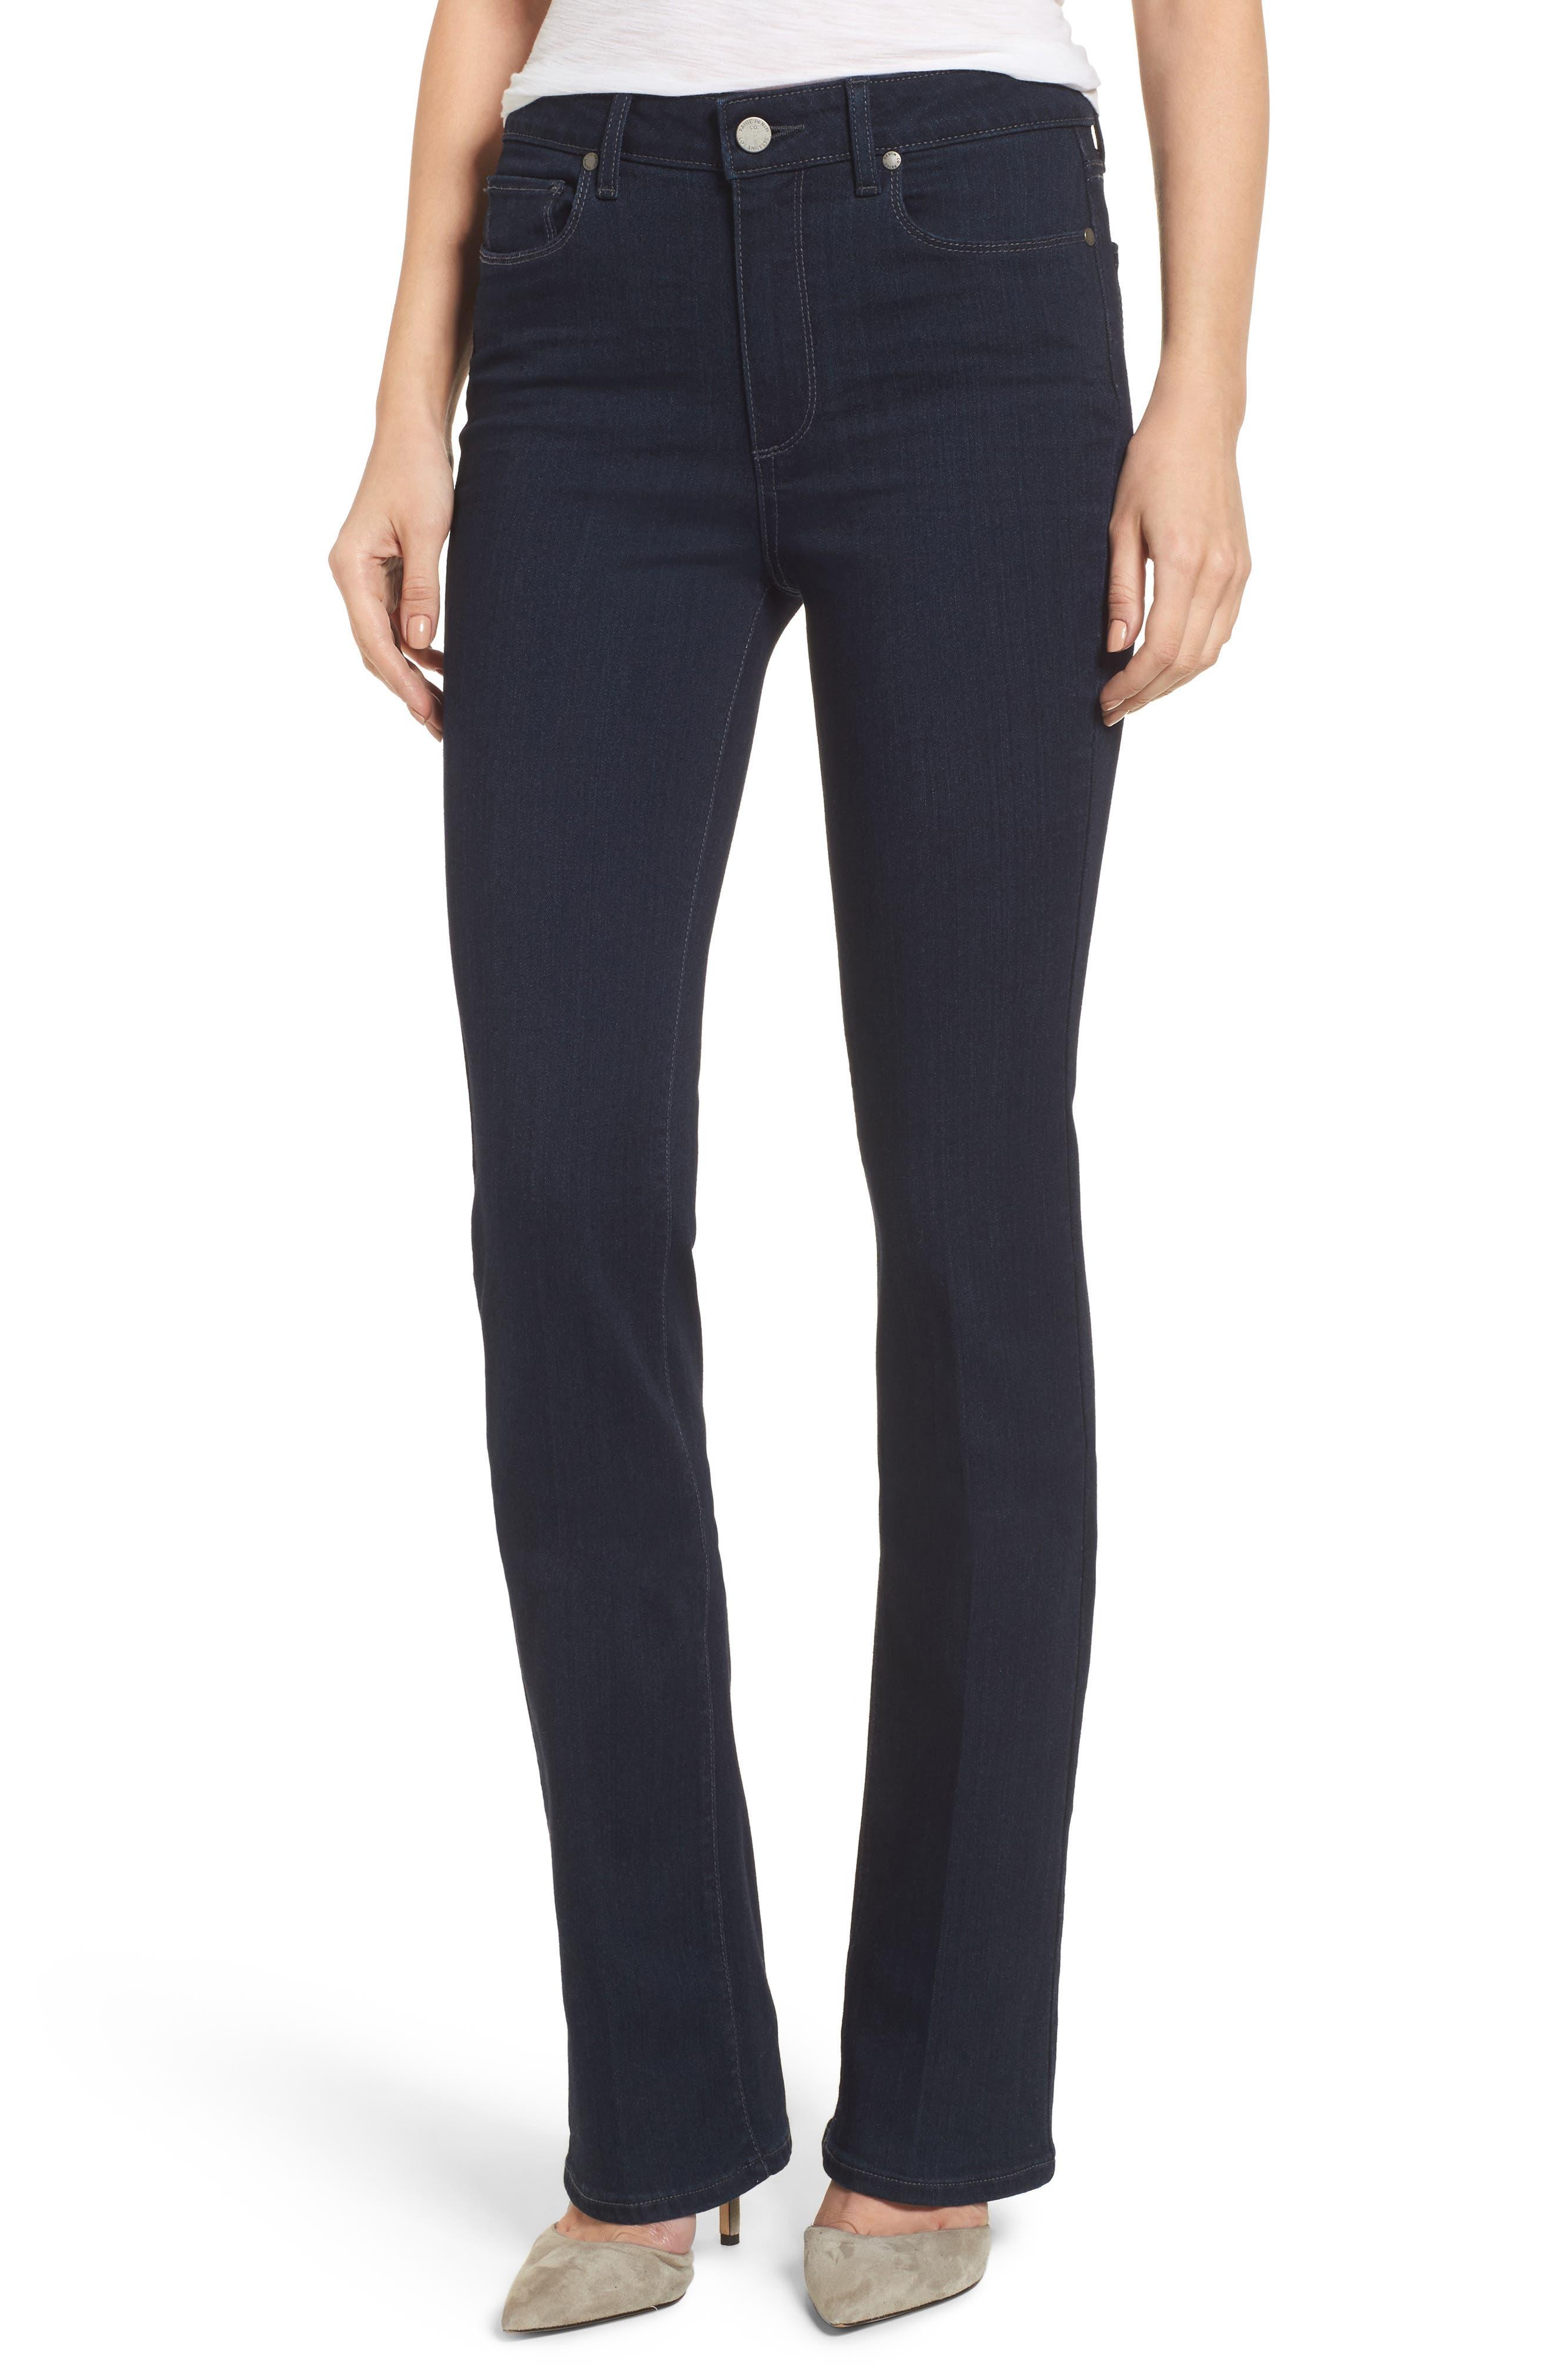 PAIGE Transcend - Manhattan High Rise Bootcut Jeans